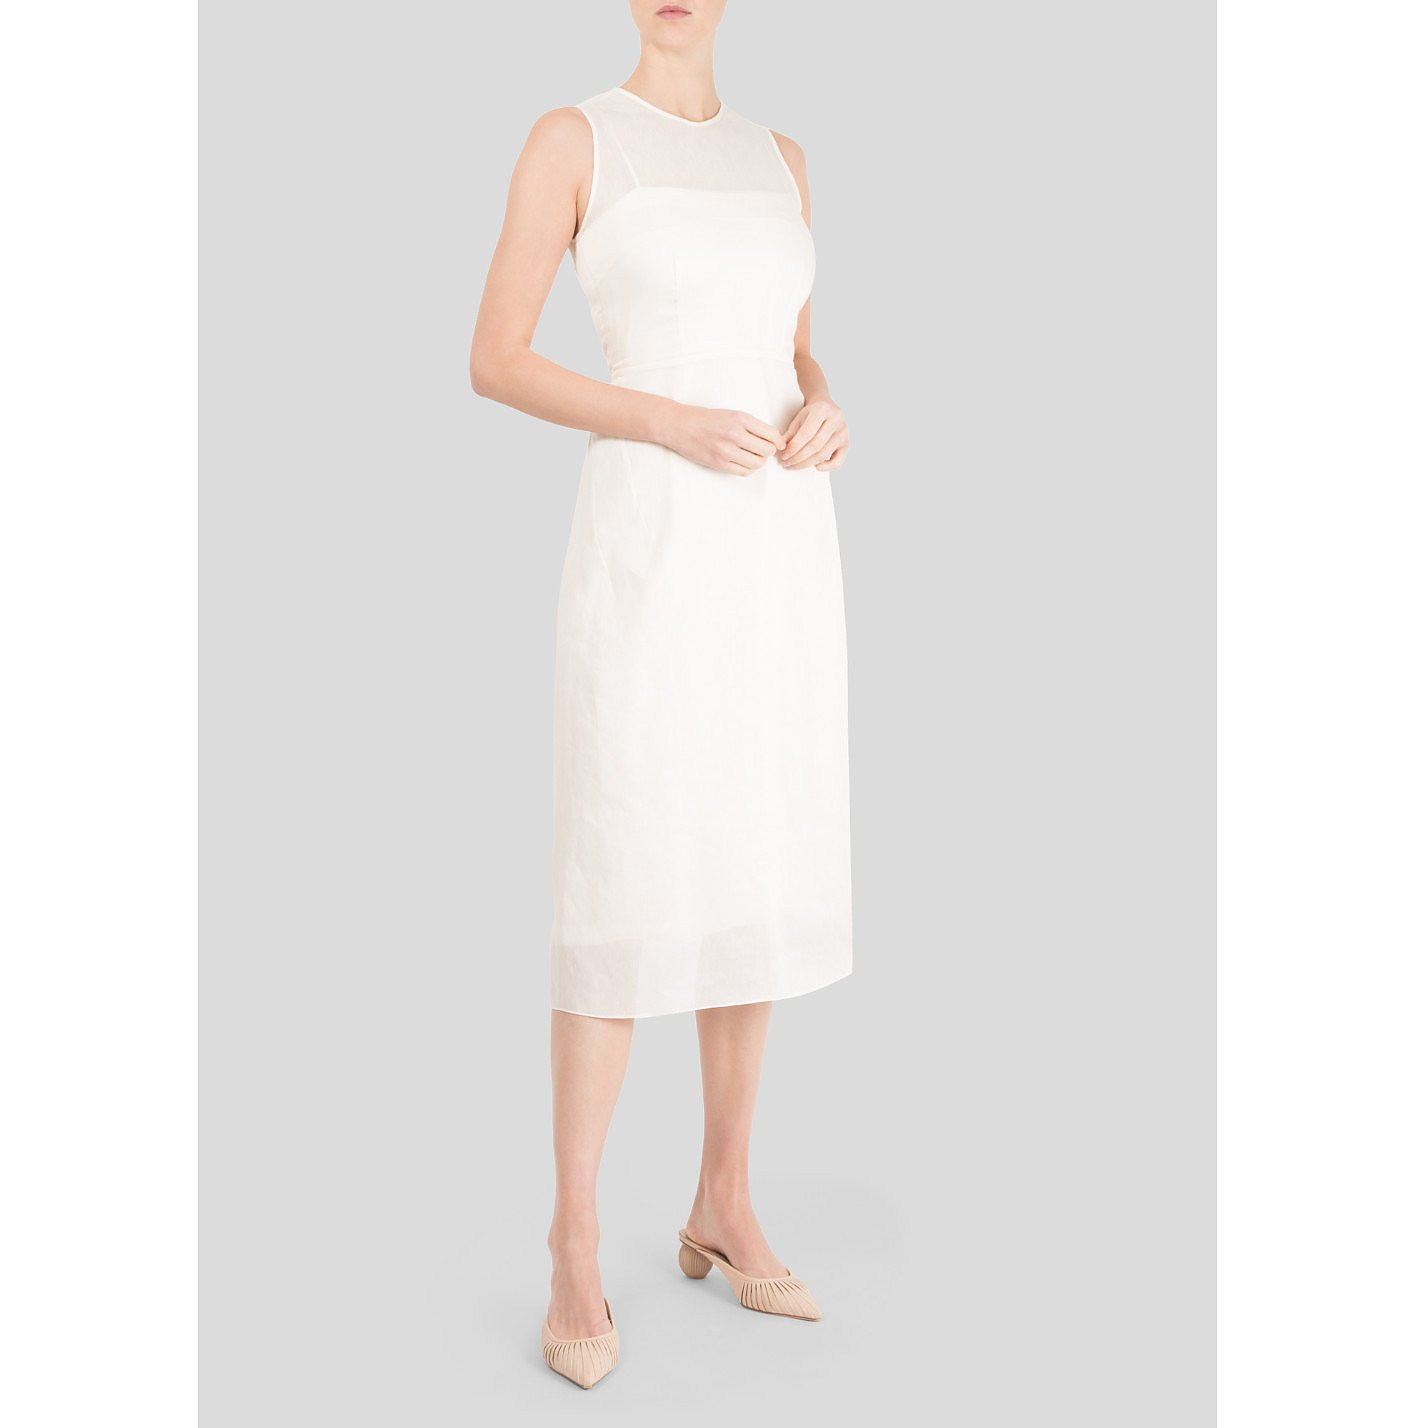 Morgane Le Fay Apron Style Silk Dress